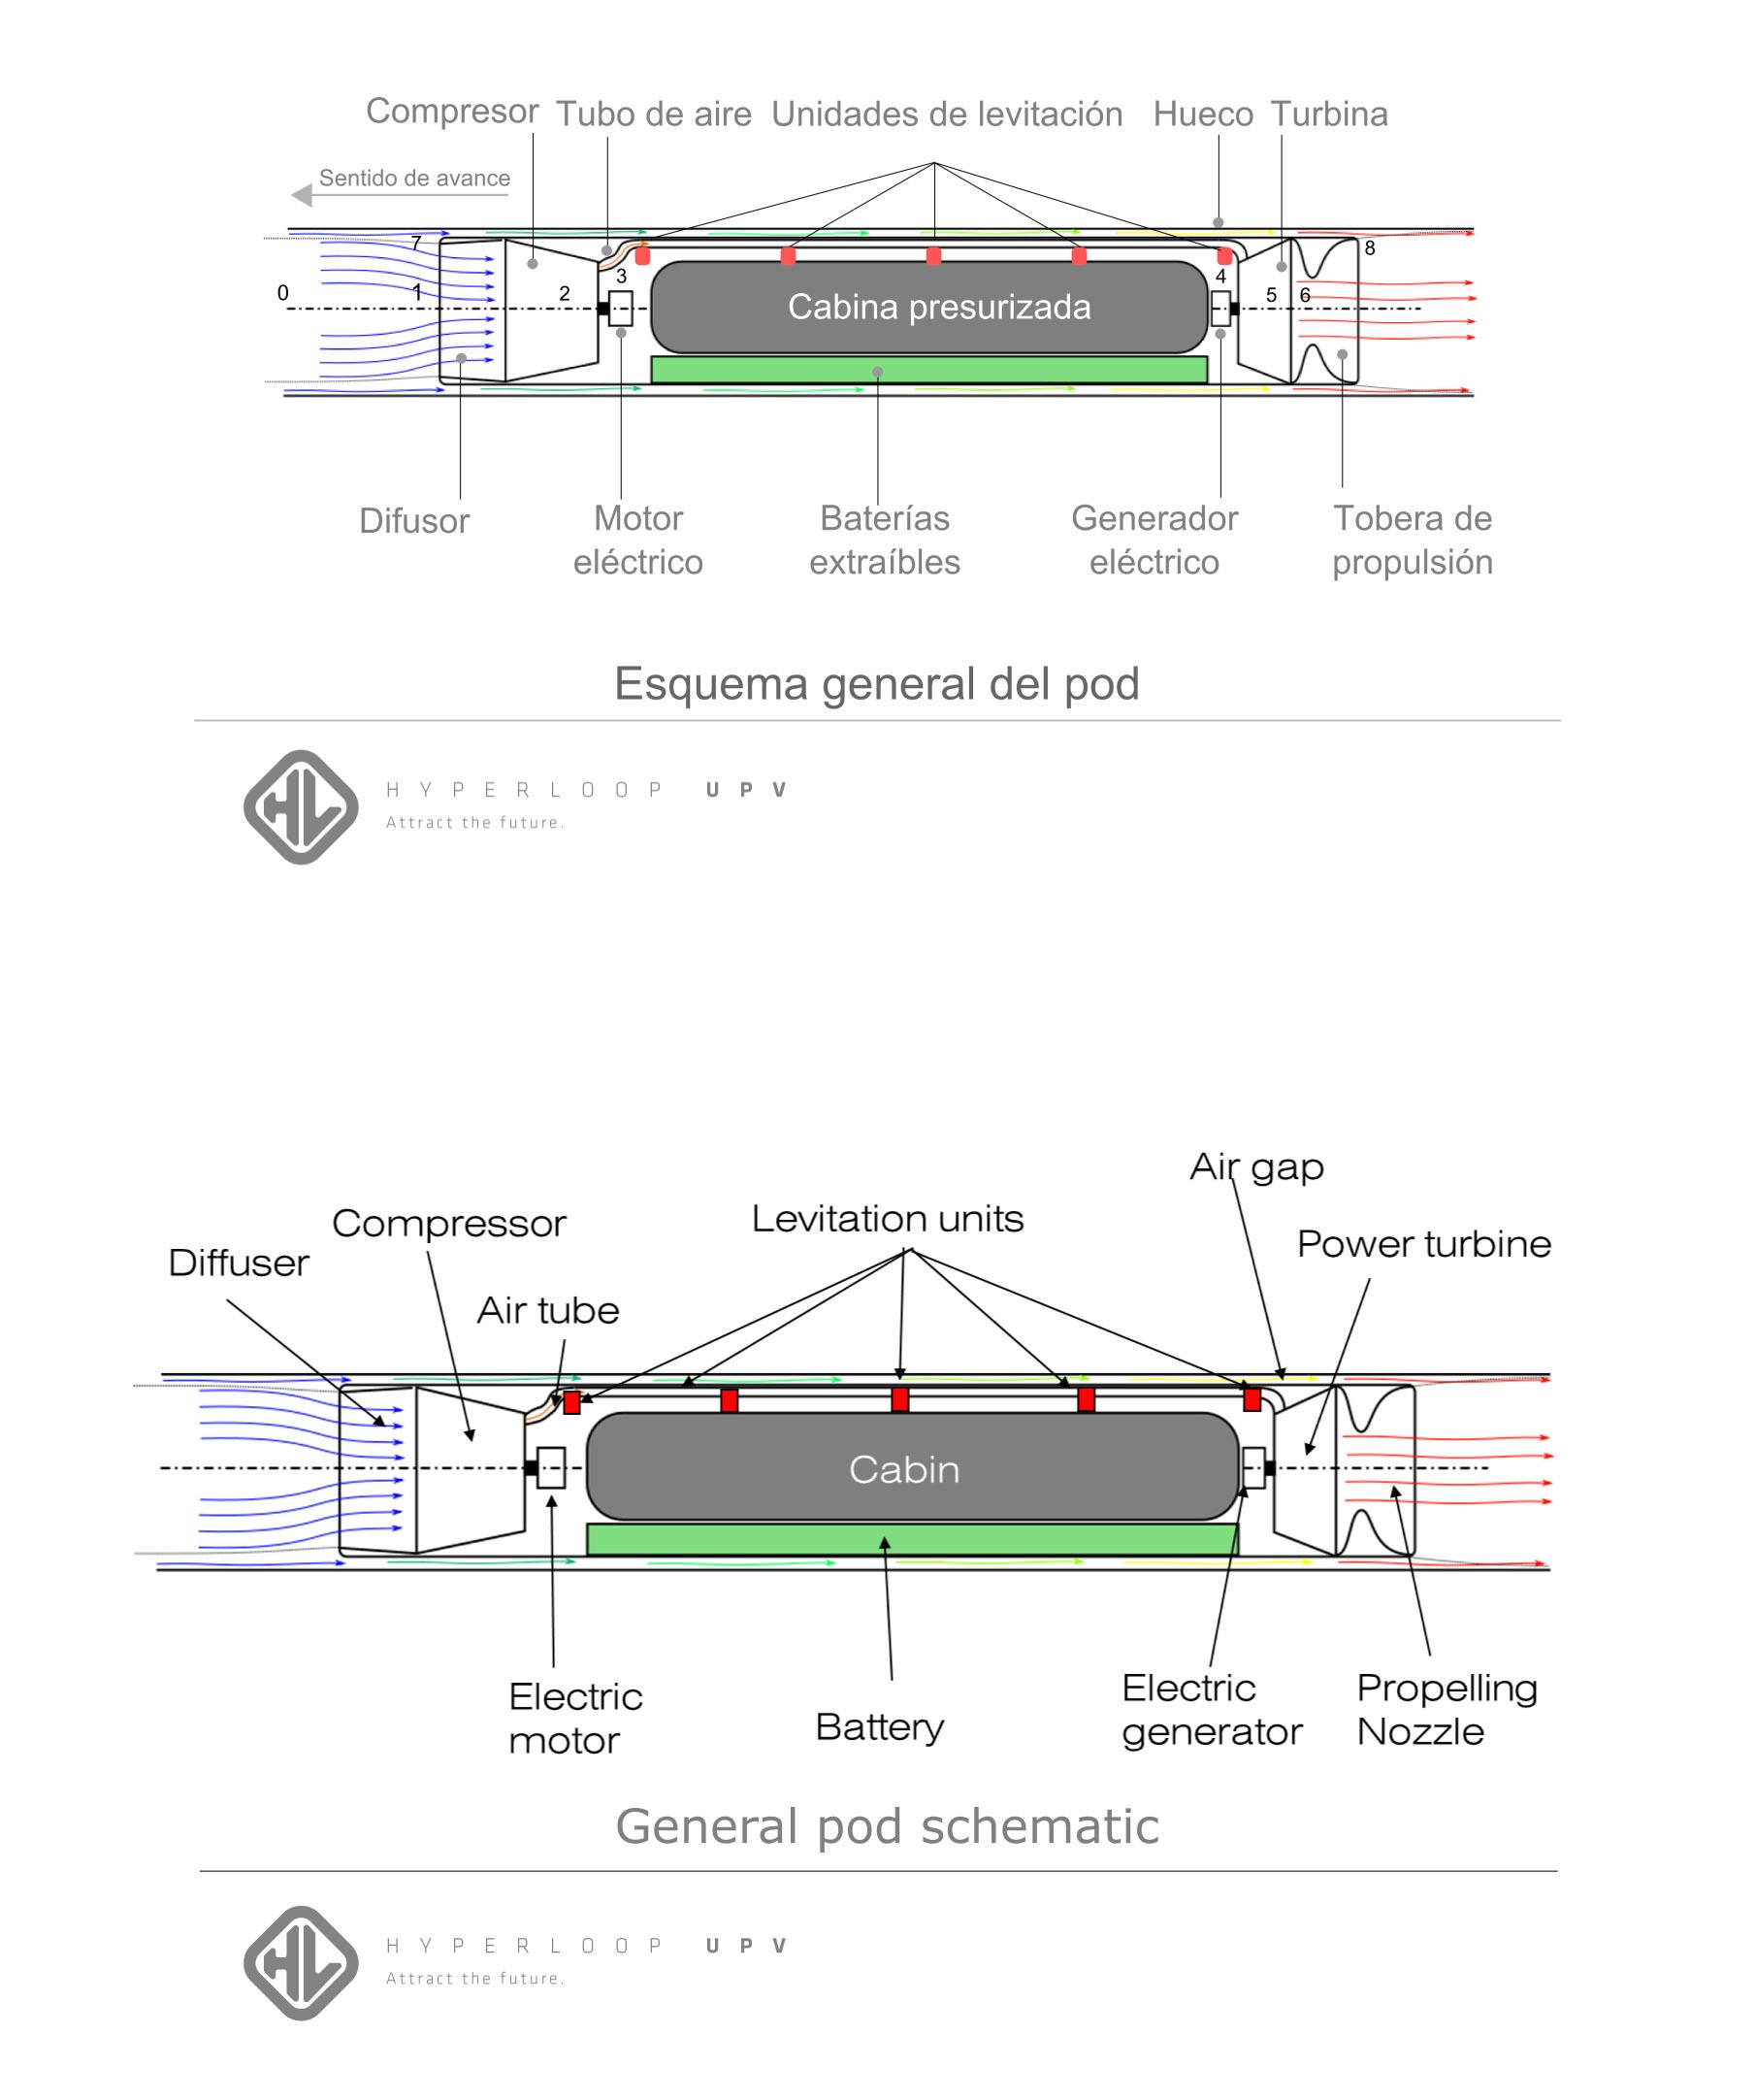 Diseño de Hyperloop de la UPV